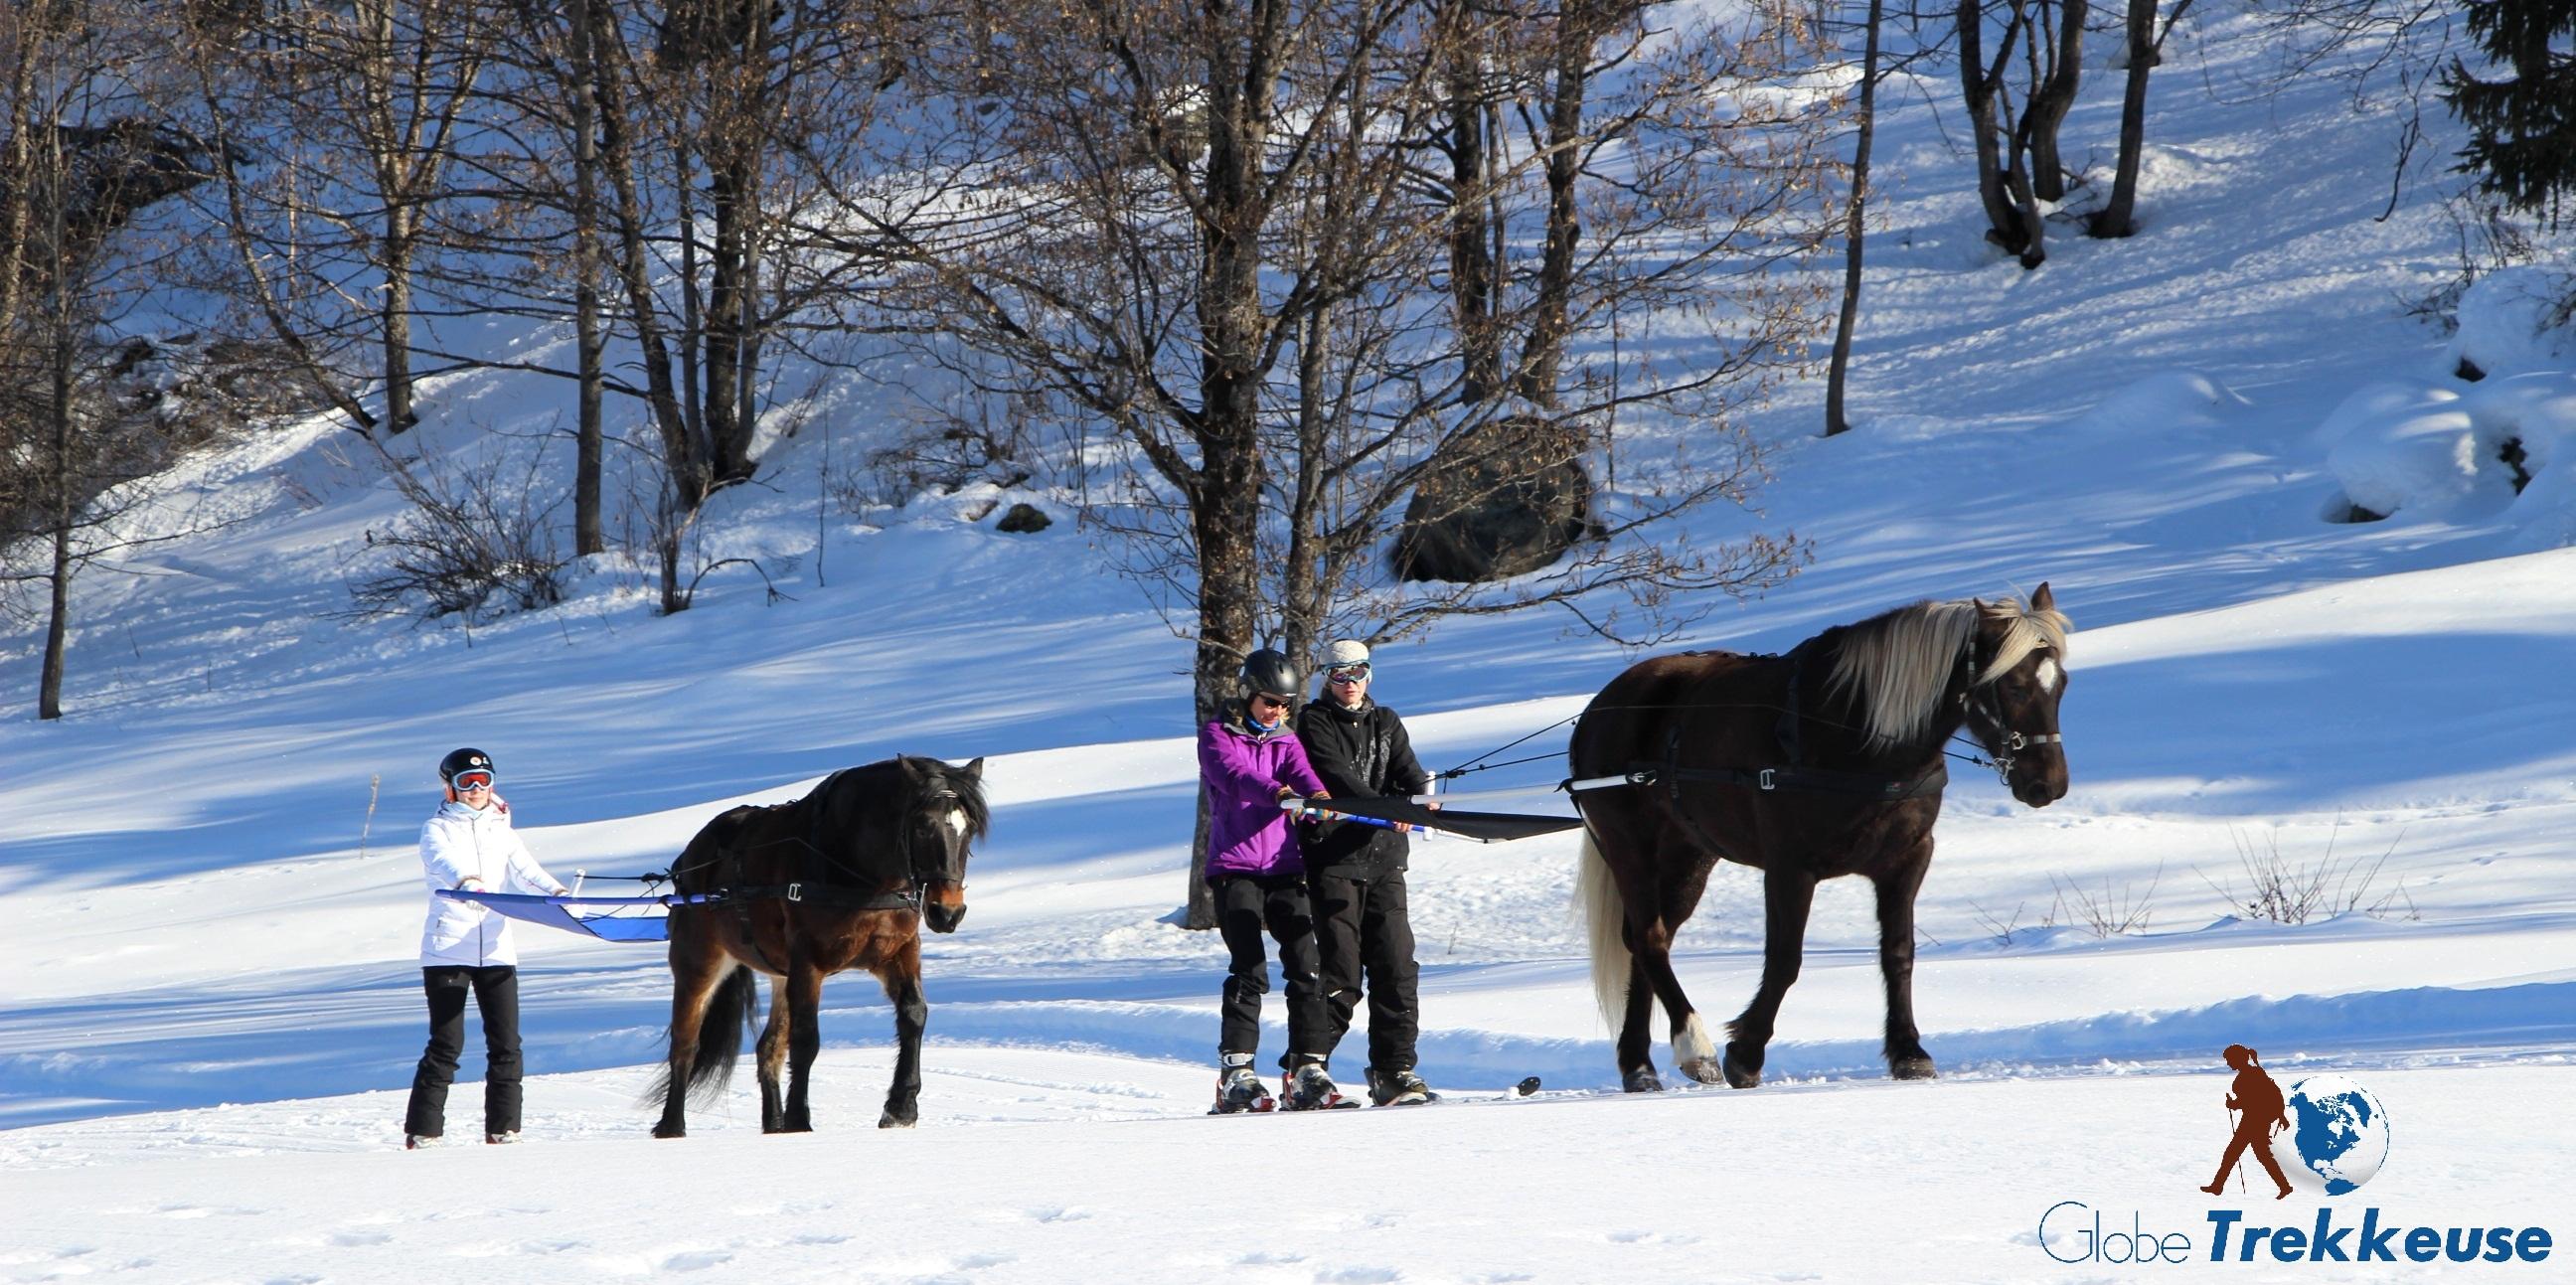 coeur equestre meribel skijoering balade